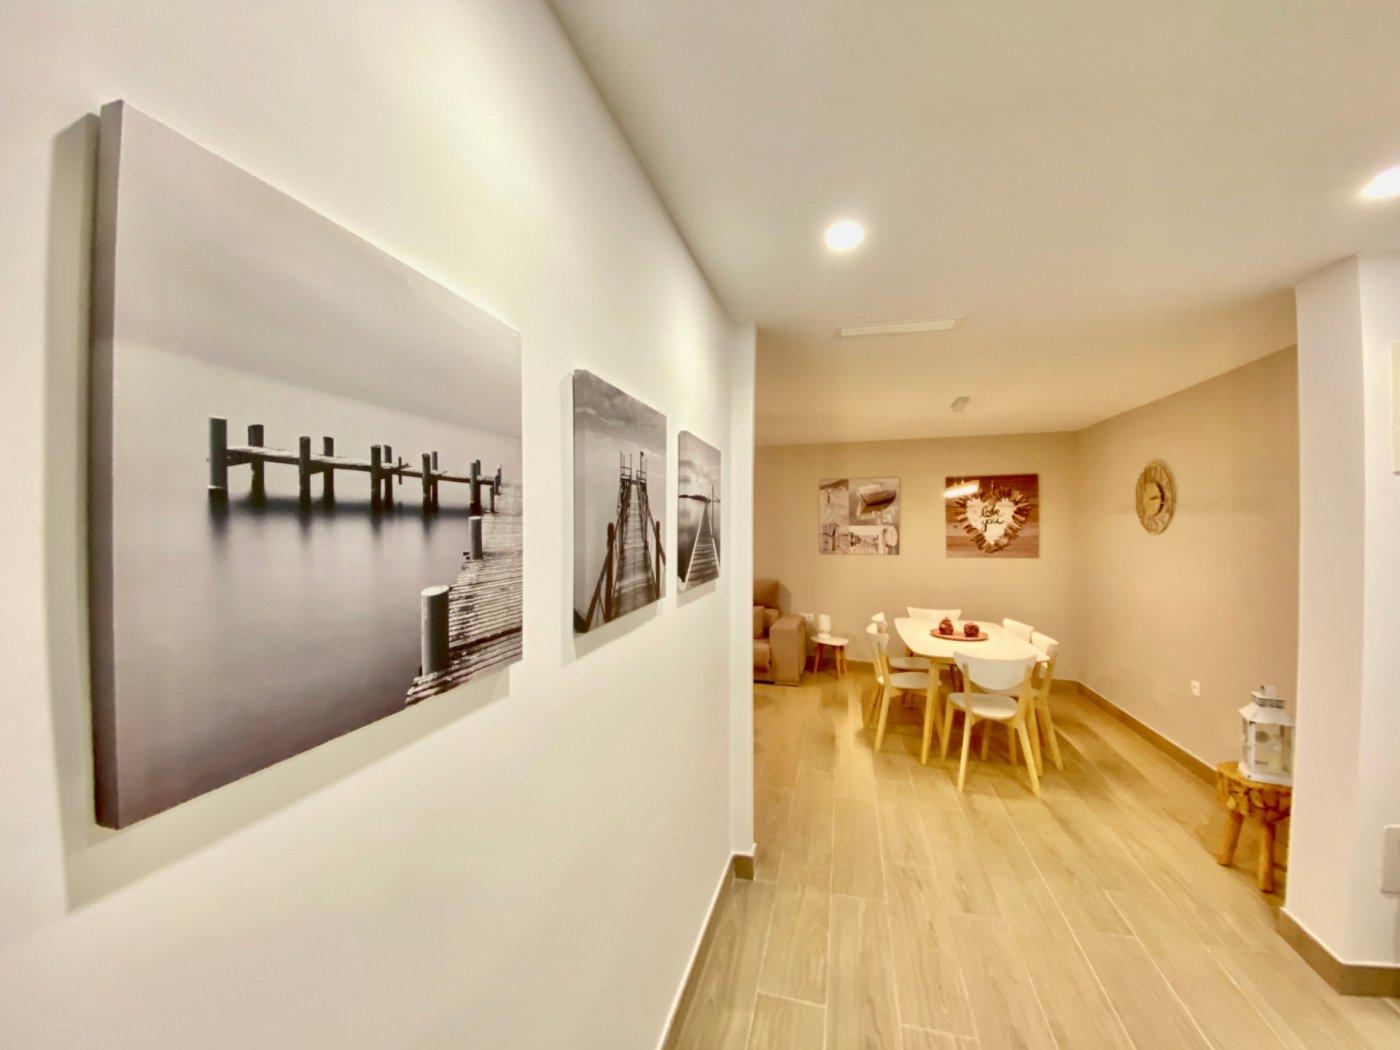 Flat for rent in Centro, Alicante